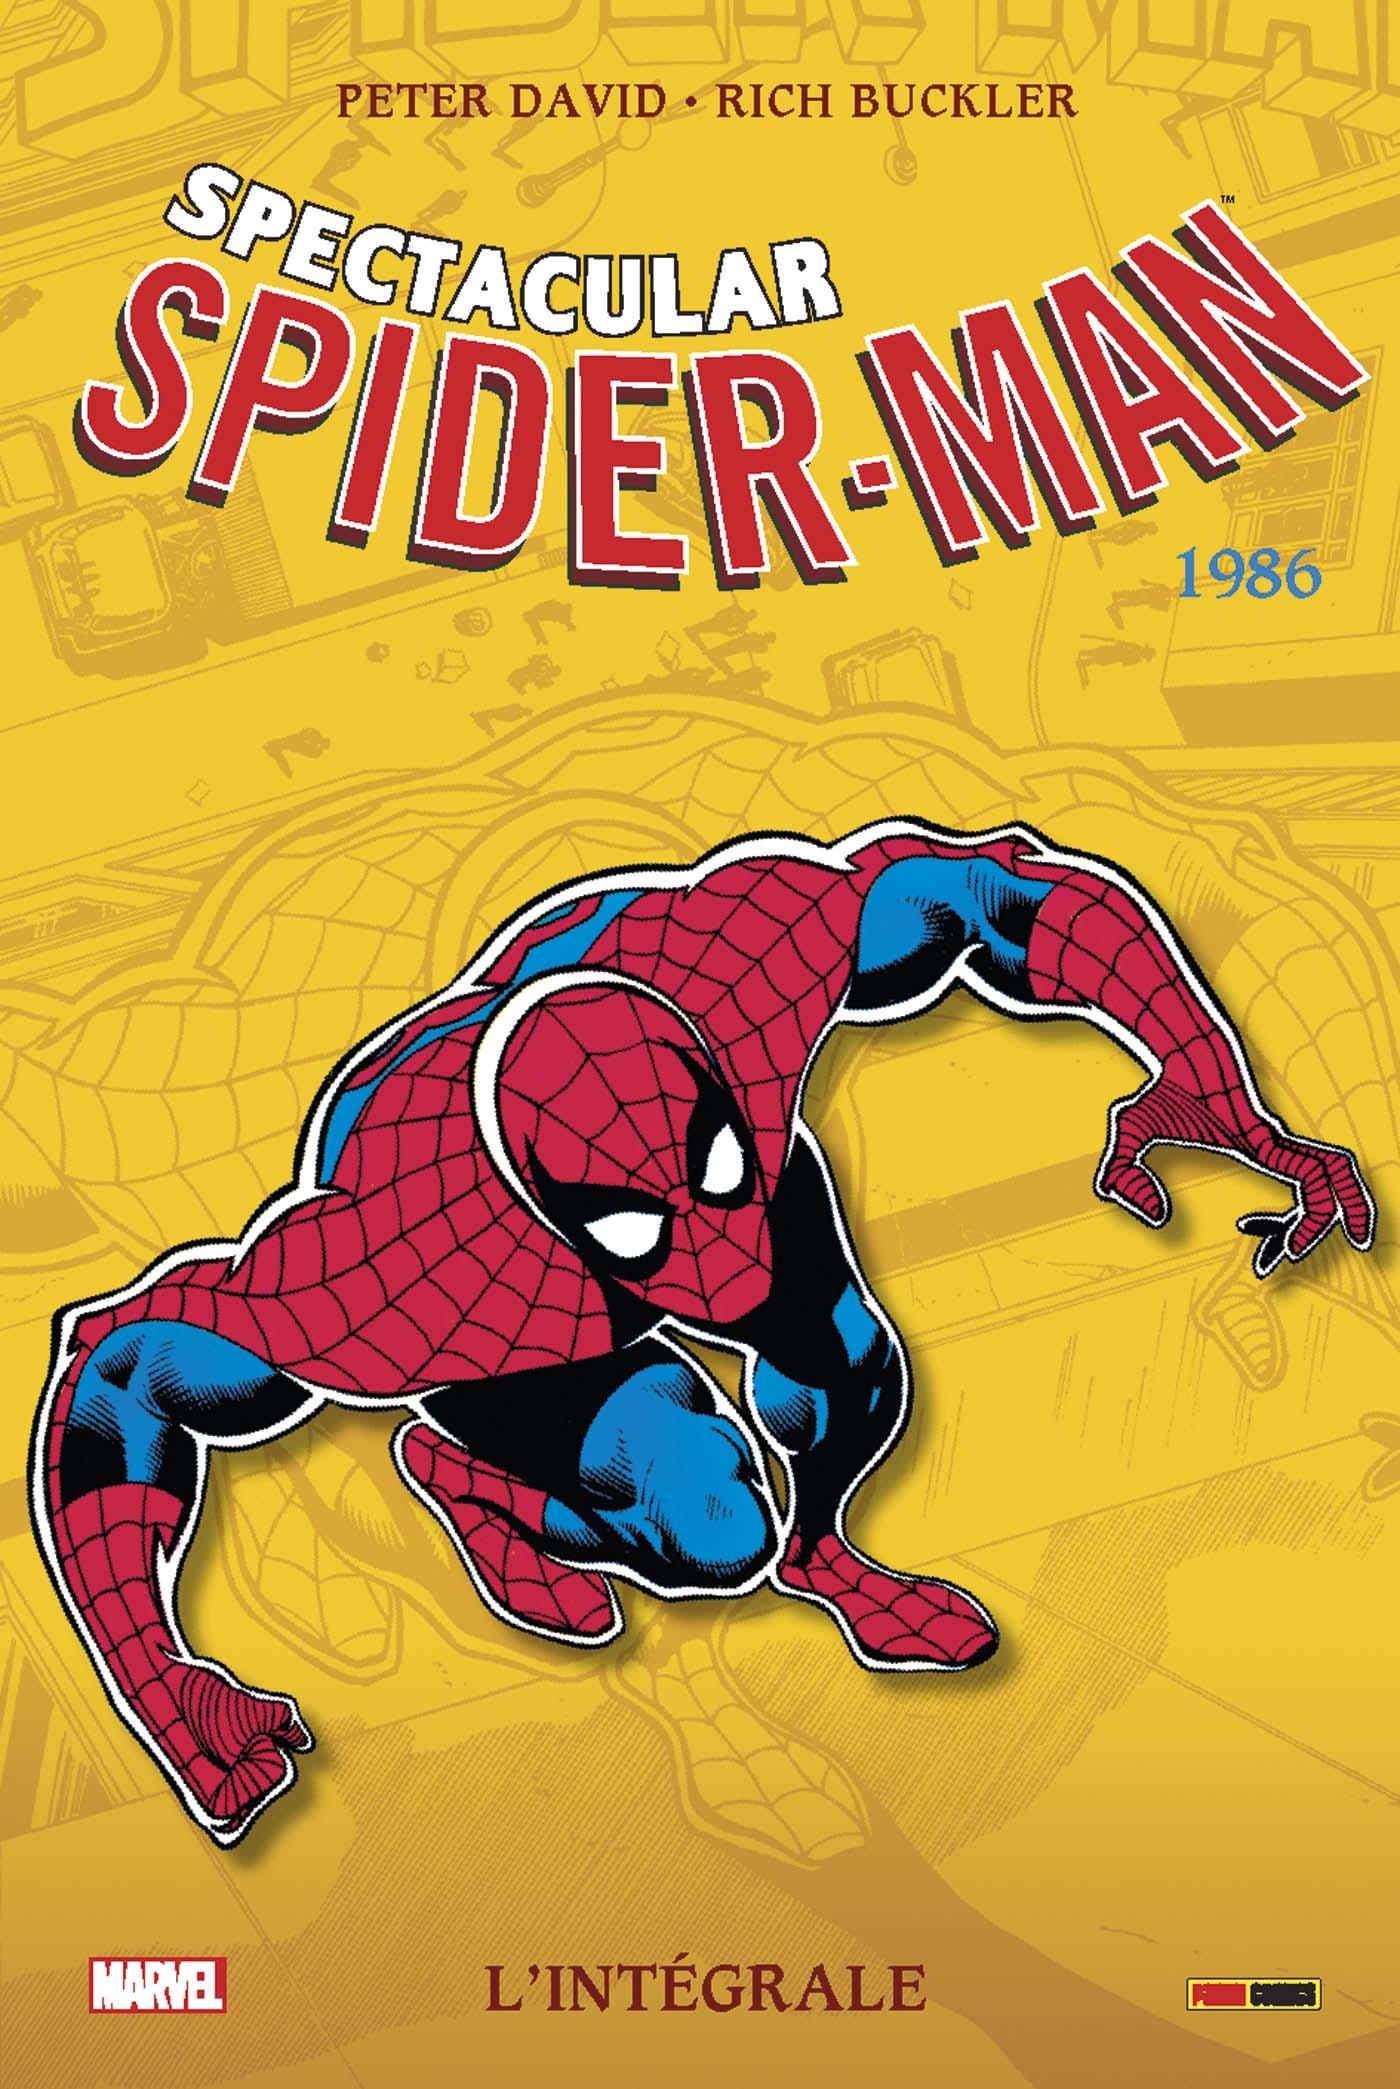 SPECTACULAR SPIDER-MAN, L'INTEGRALE 1986